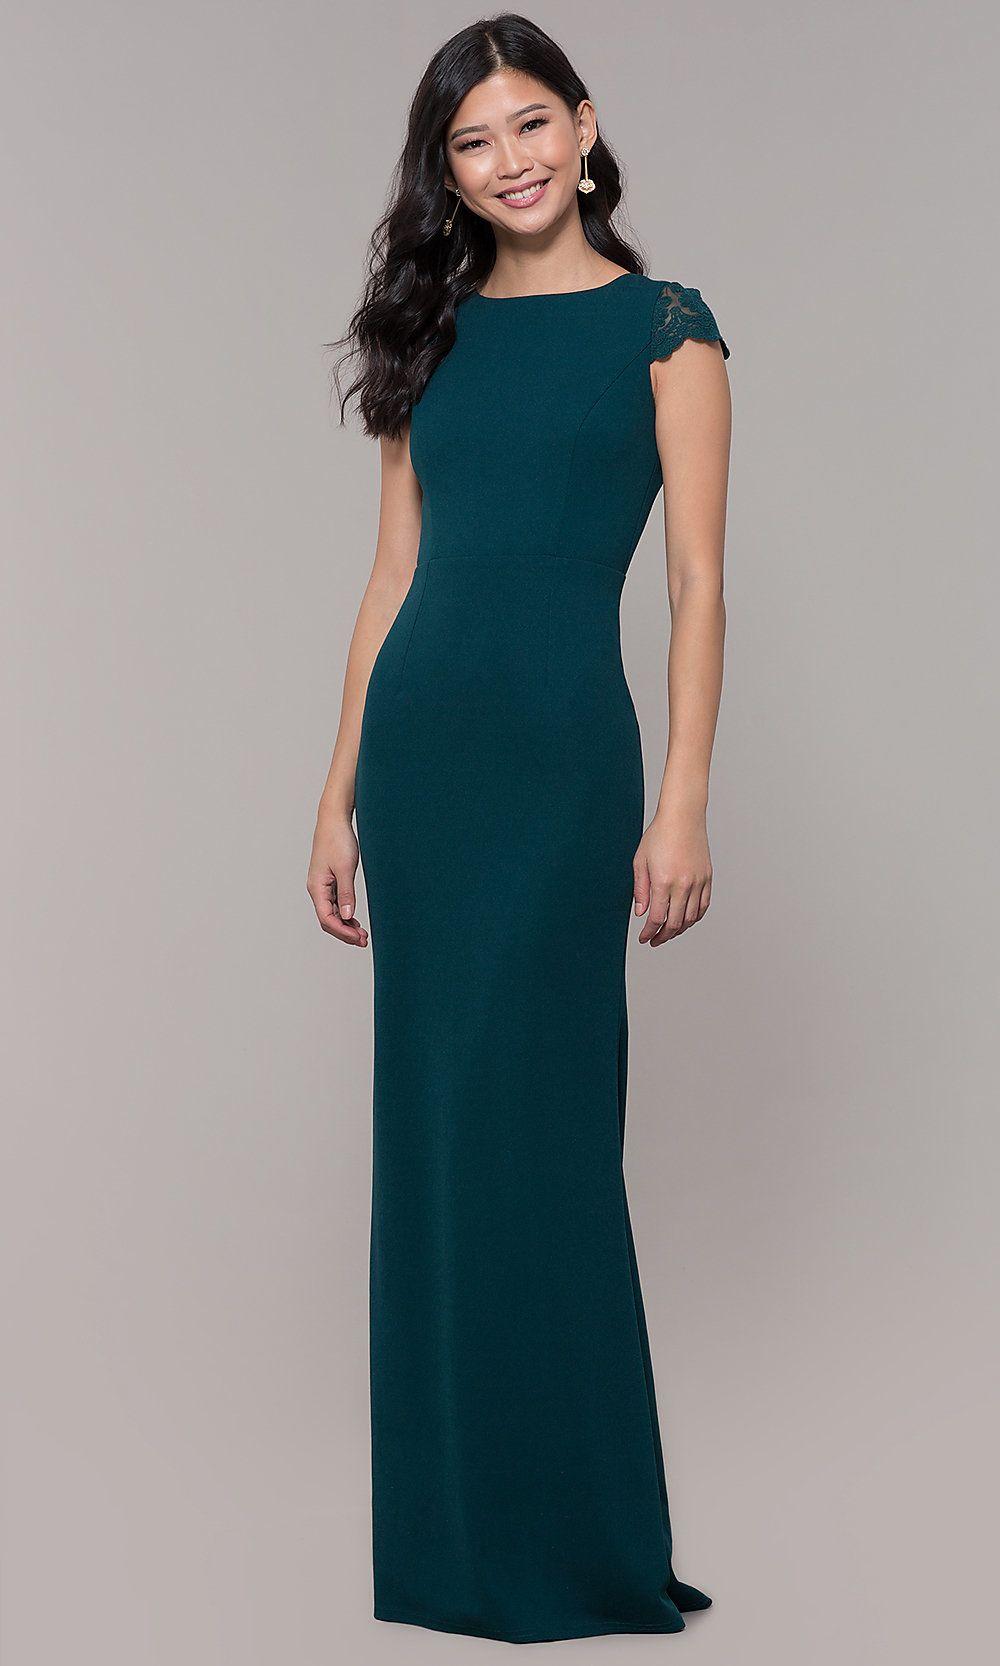 19++ Cap sleeve chiffon prom dress ideas